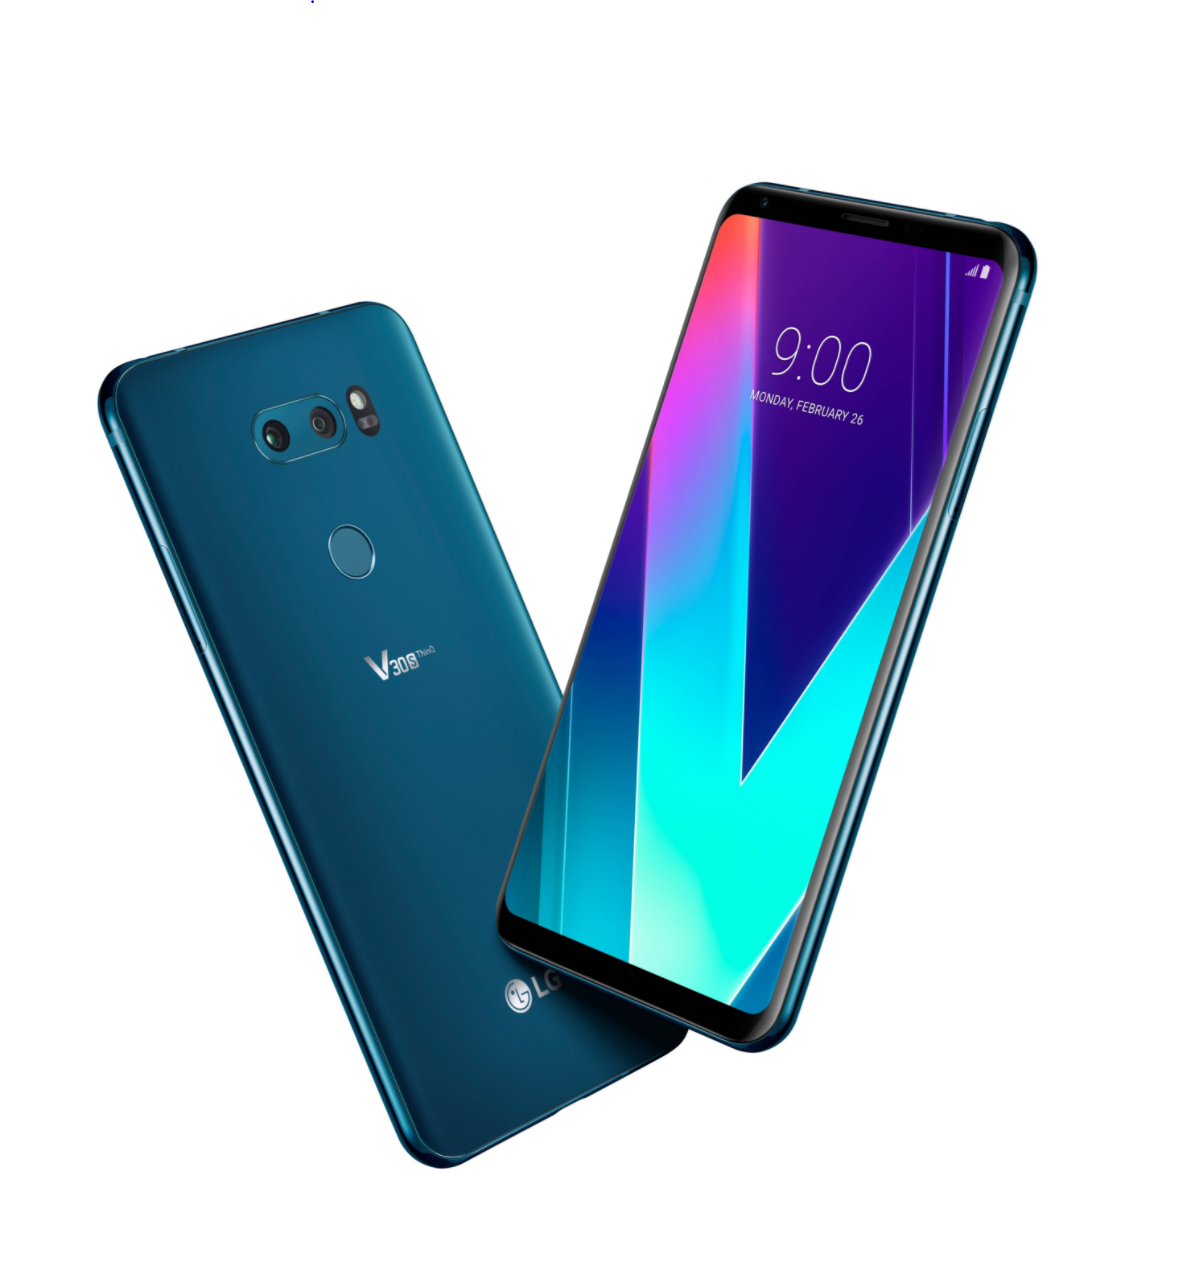 LG、「LG V30」のグレードアップモデル「V30S ThinQ」を発表、AI機能をアピール